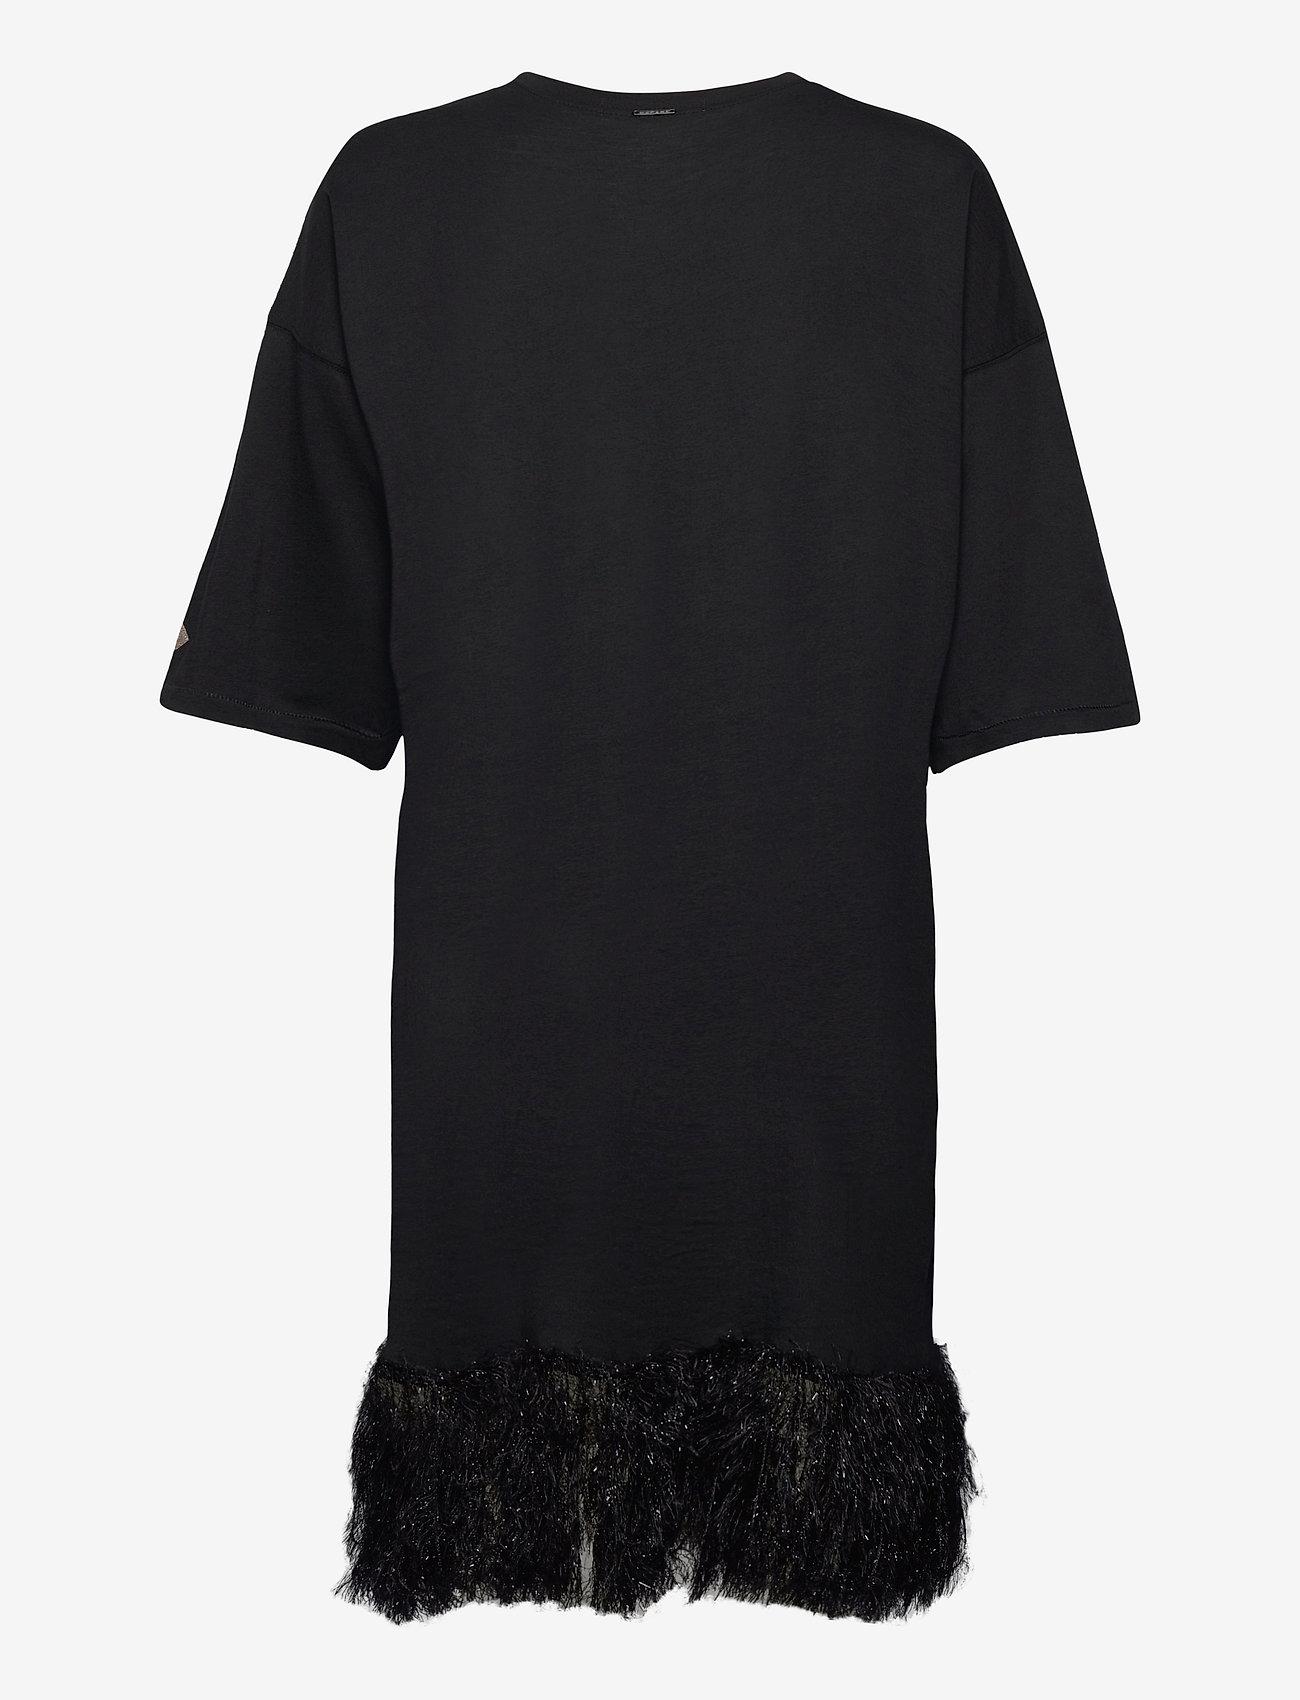 Replay - T-Shirt - t-shirts - blackboard - 1